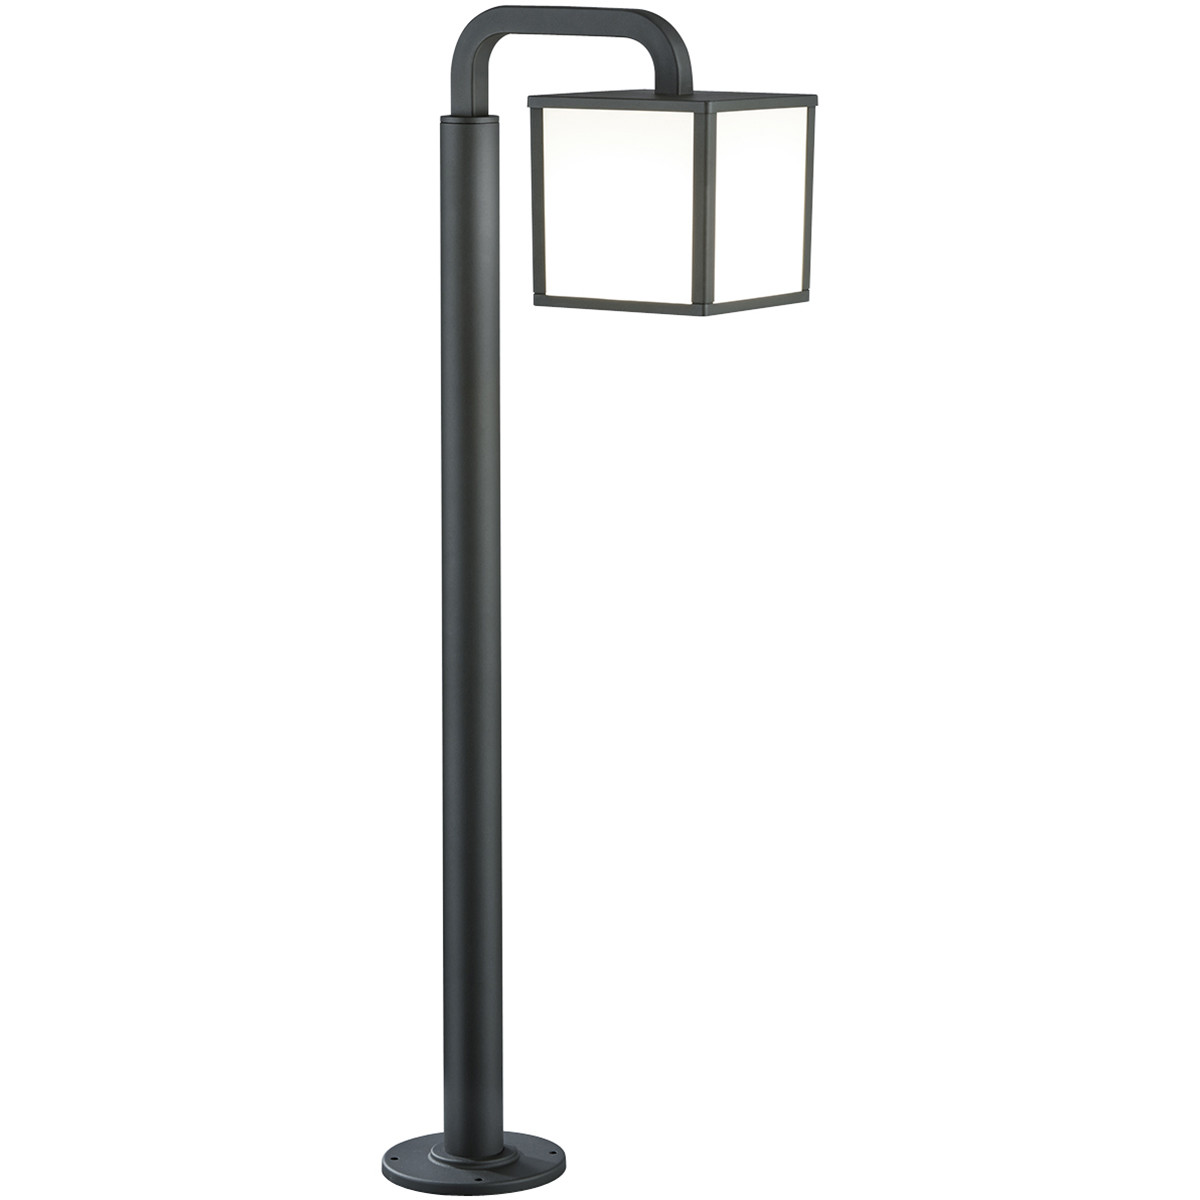 LED Tuinverlichting - Buitenlamp - Trion Cubirino - Staand - 5W - E27 Fitting - Mat Zwart - Aluminiu